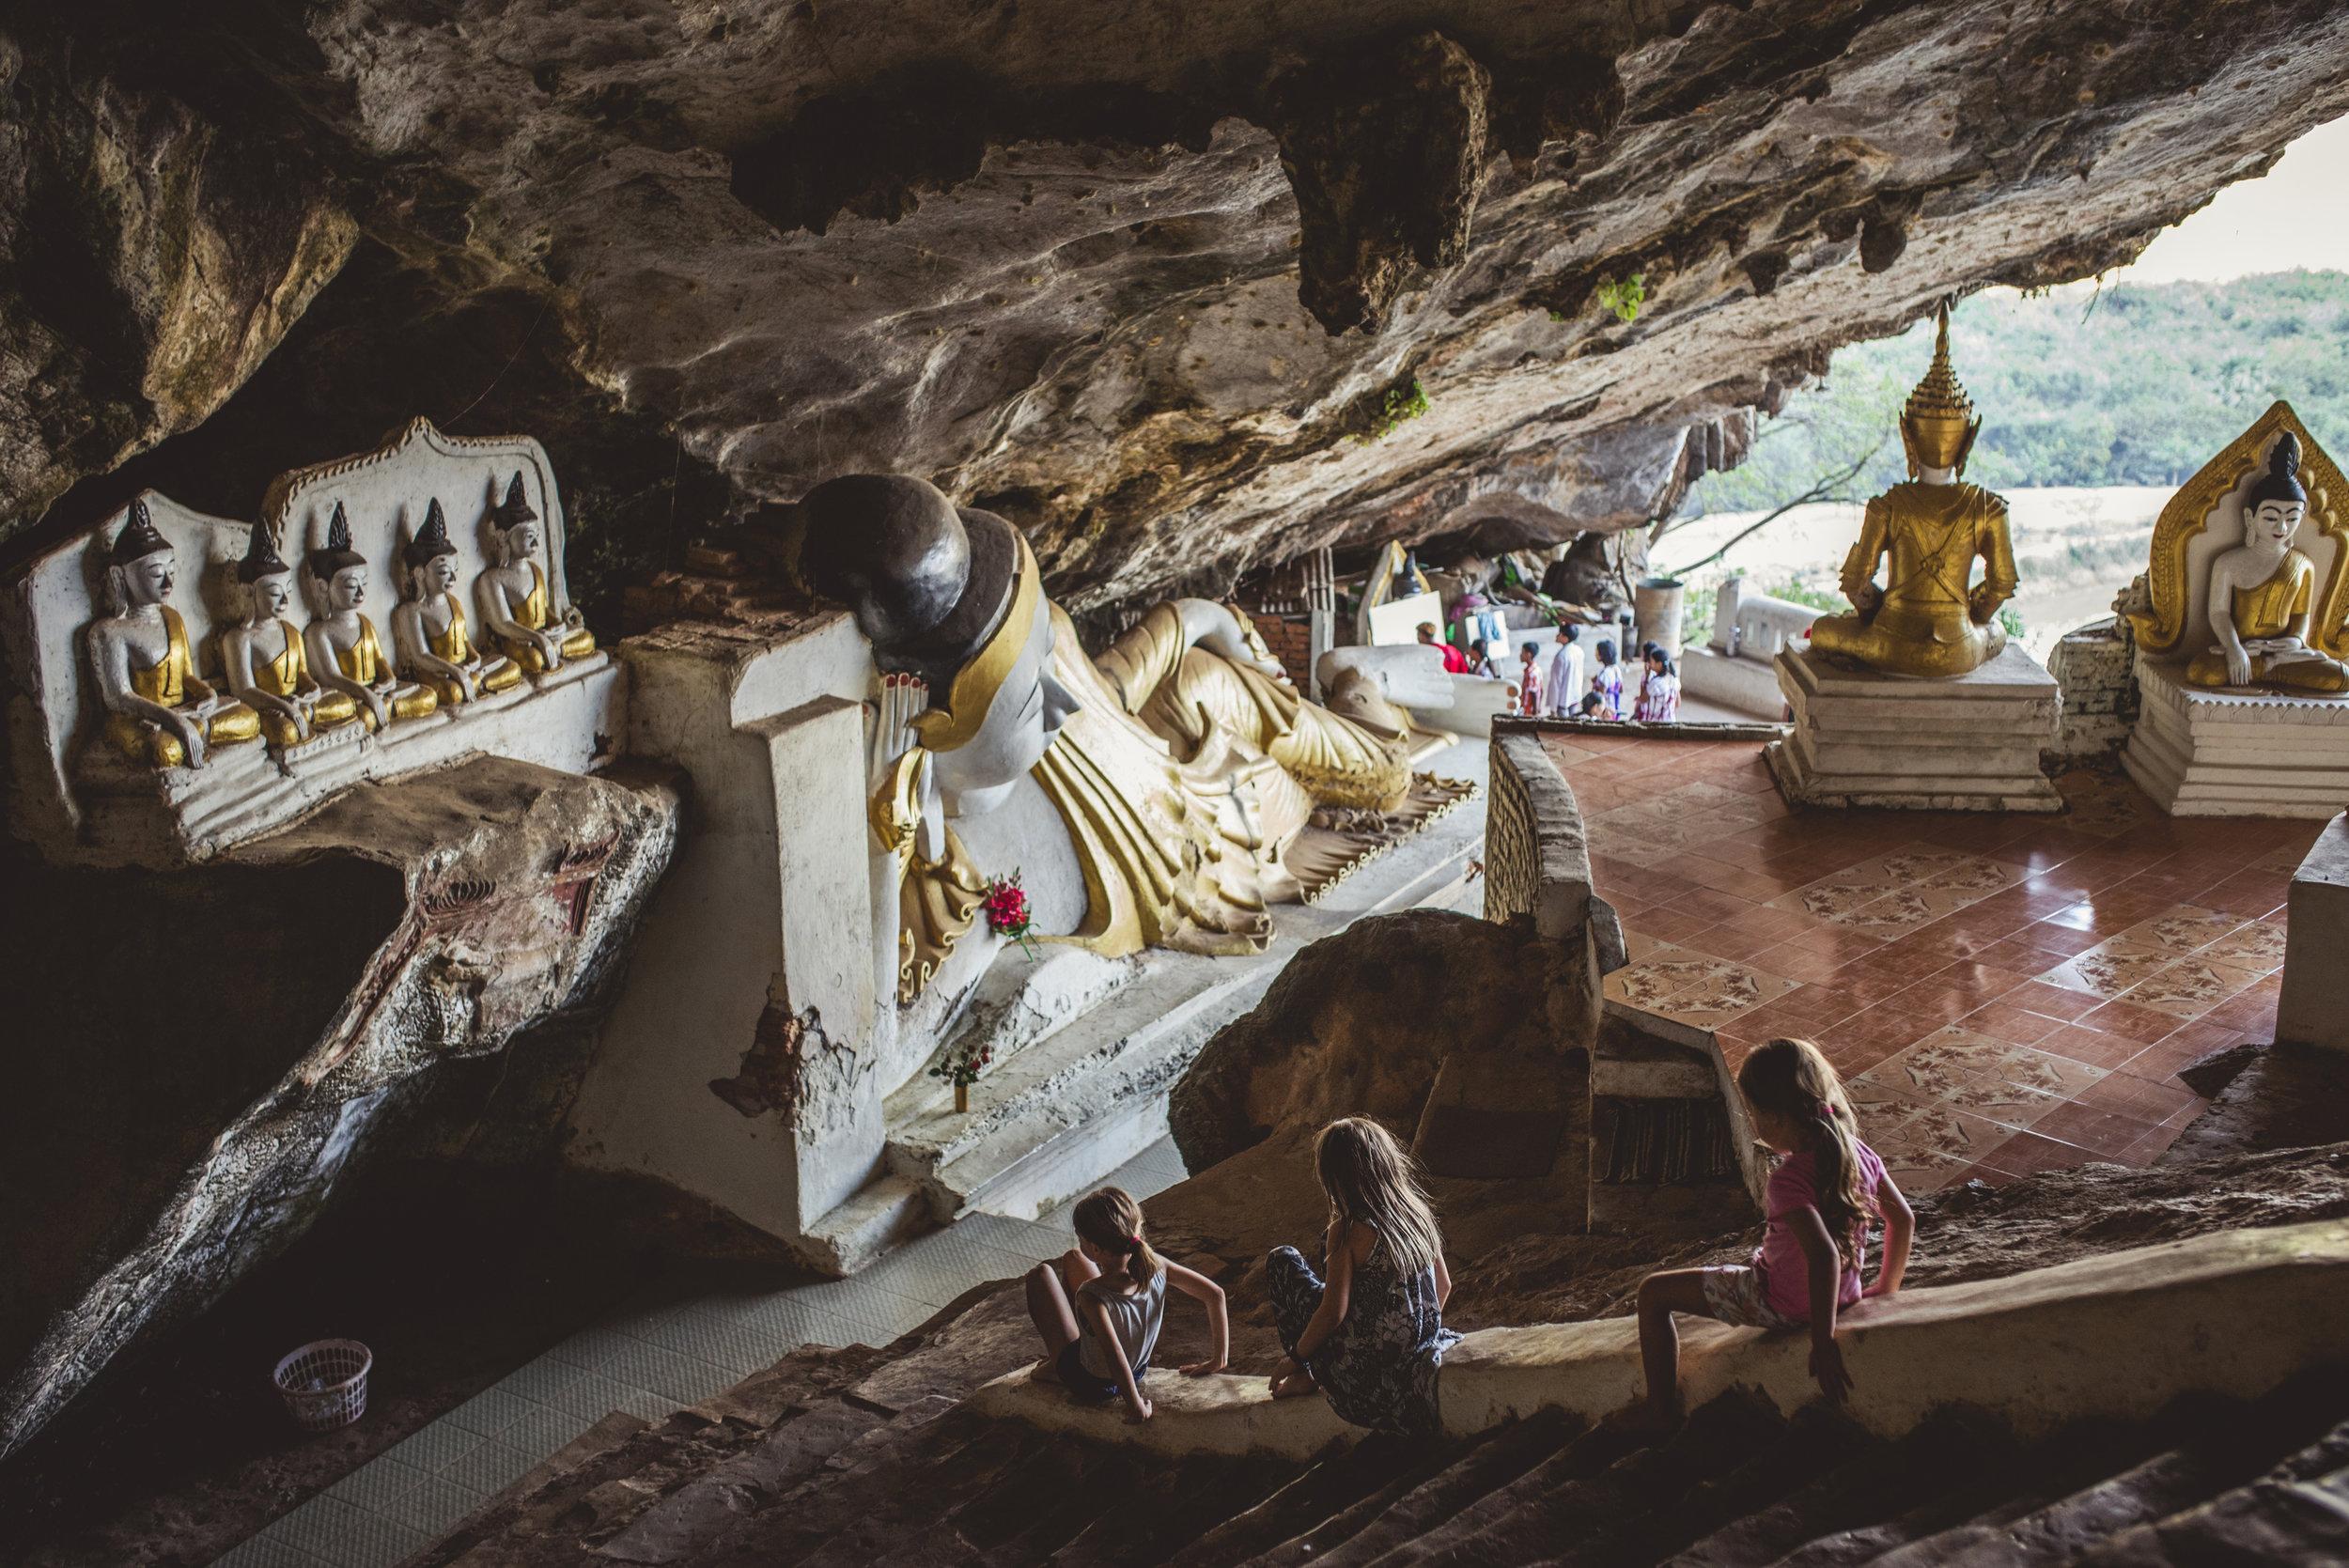 Exploring Yathaypyan Cave